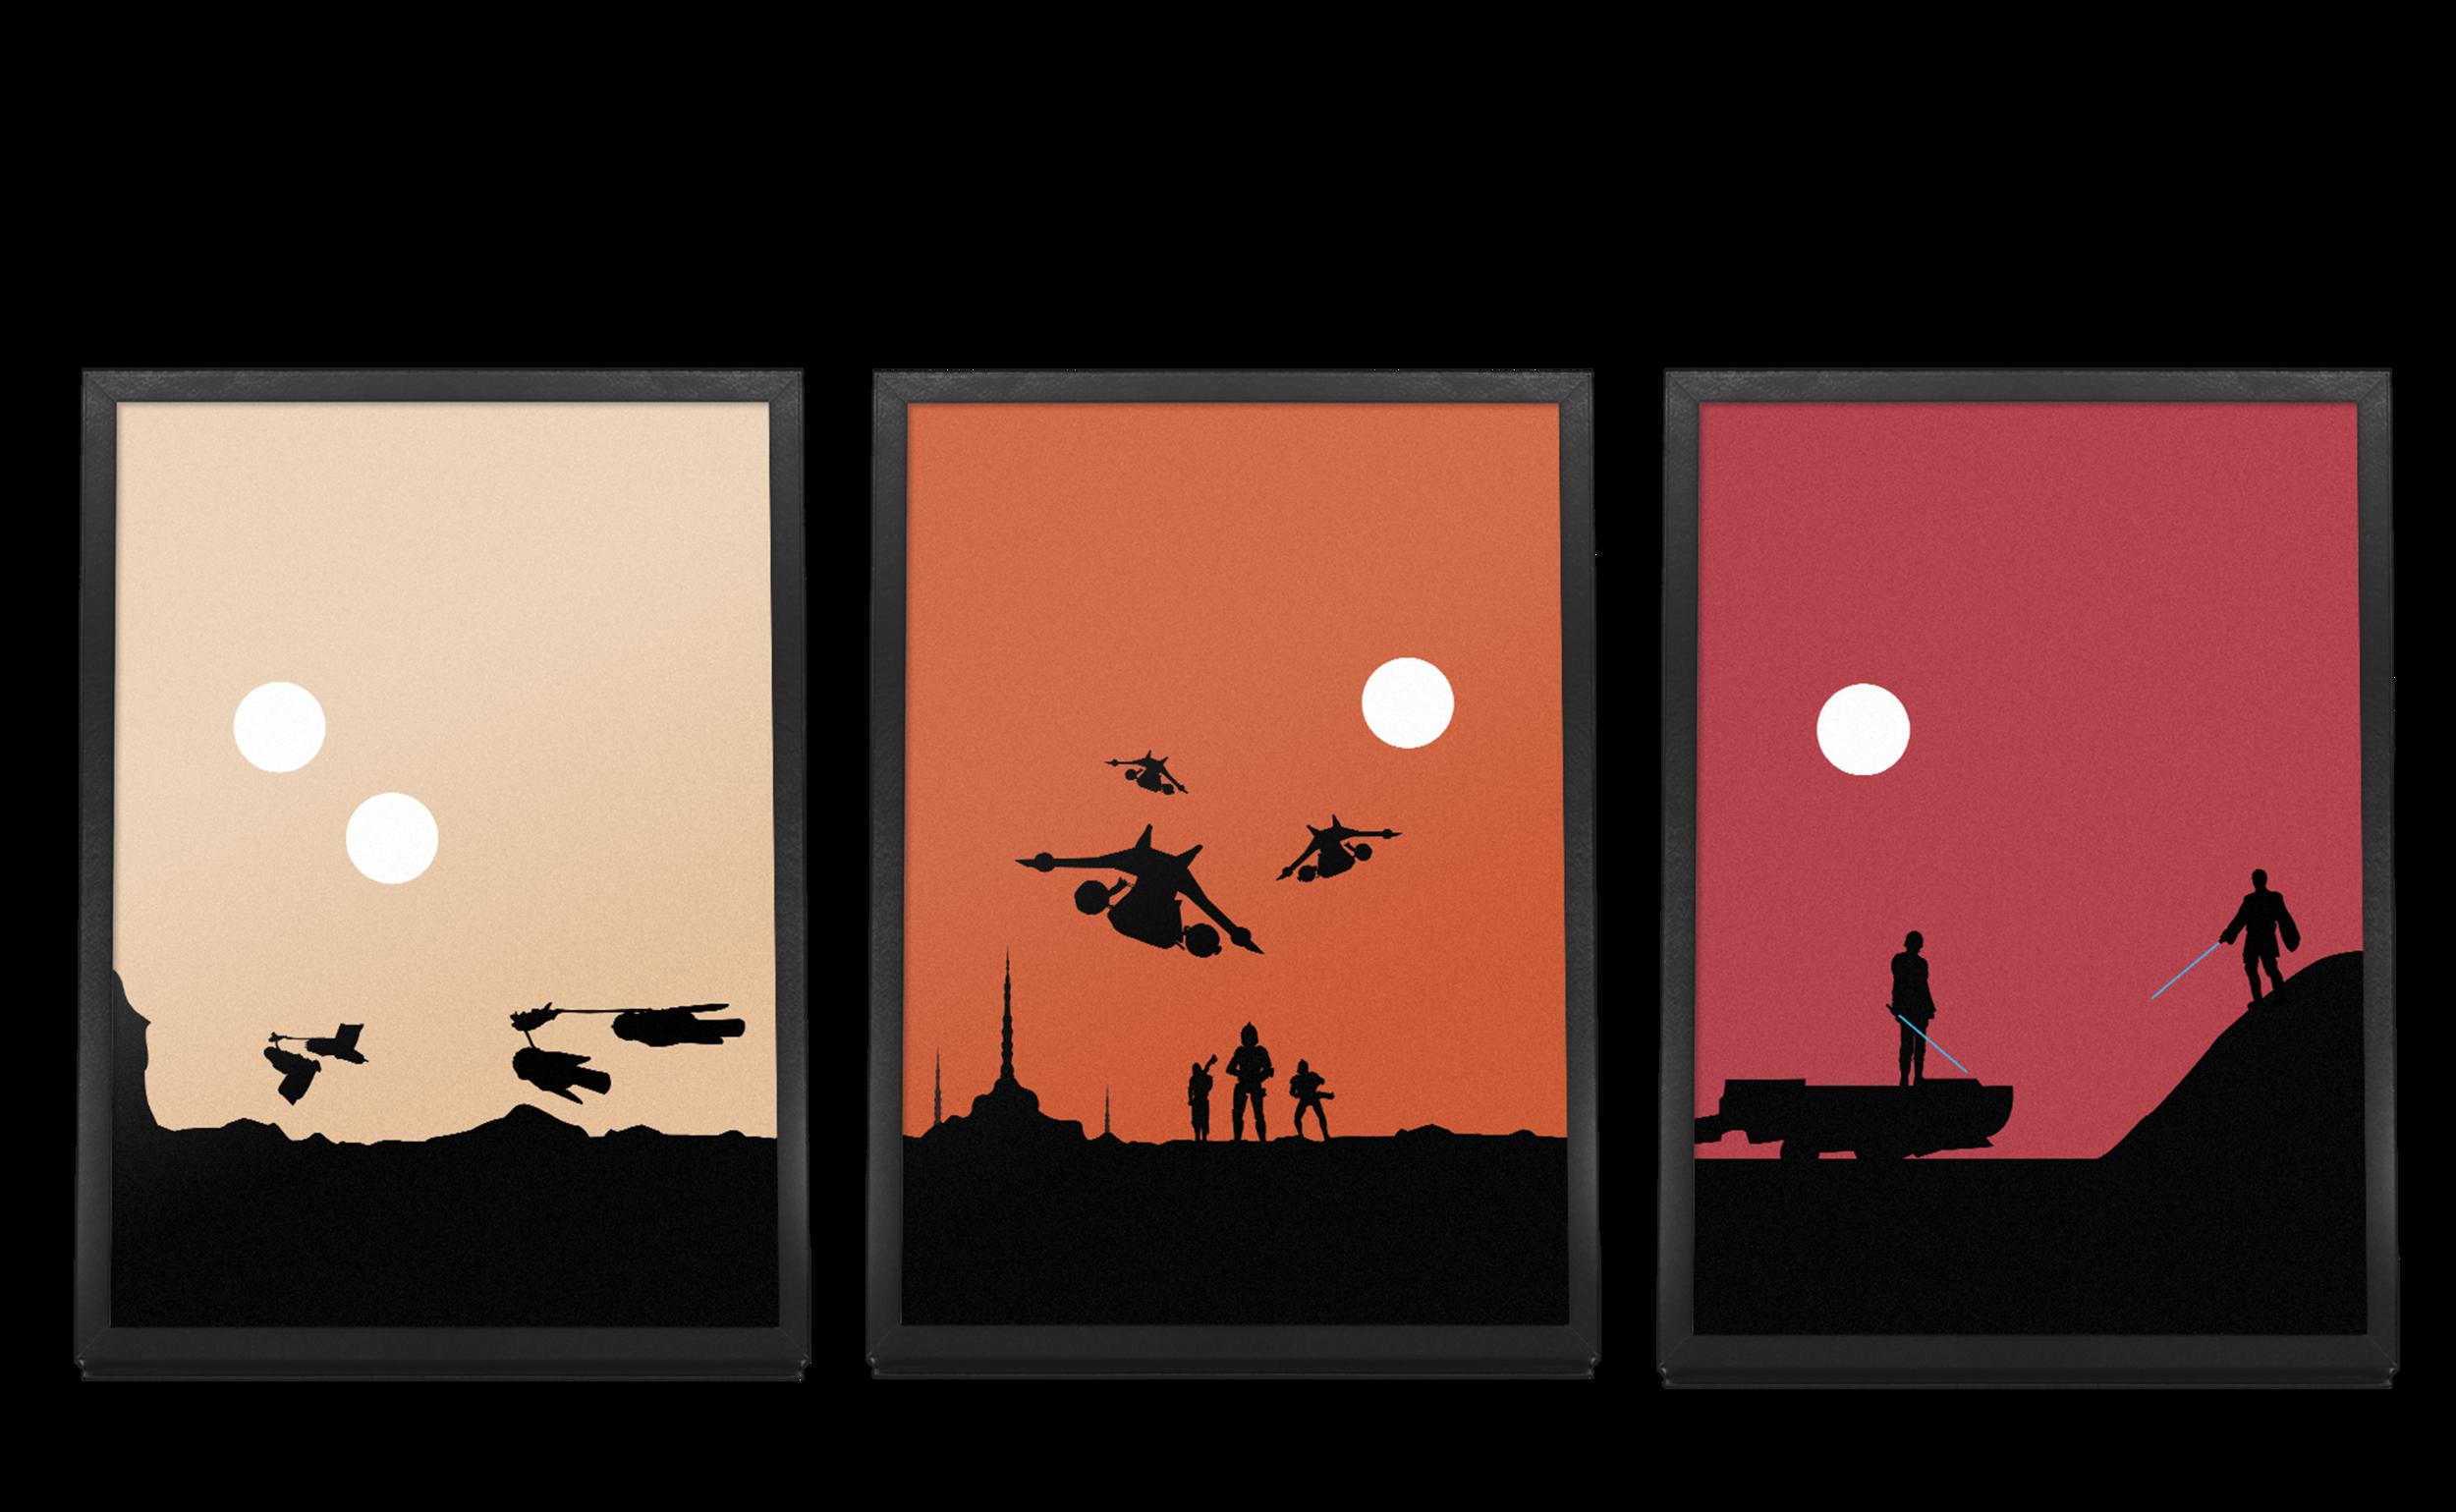 Star Wars Minimalist Posters by Joe Elam 1.png